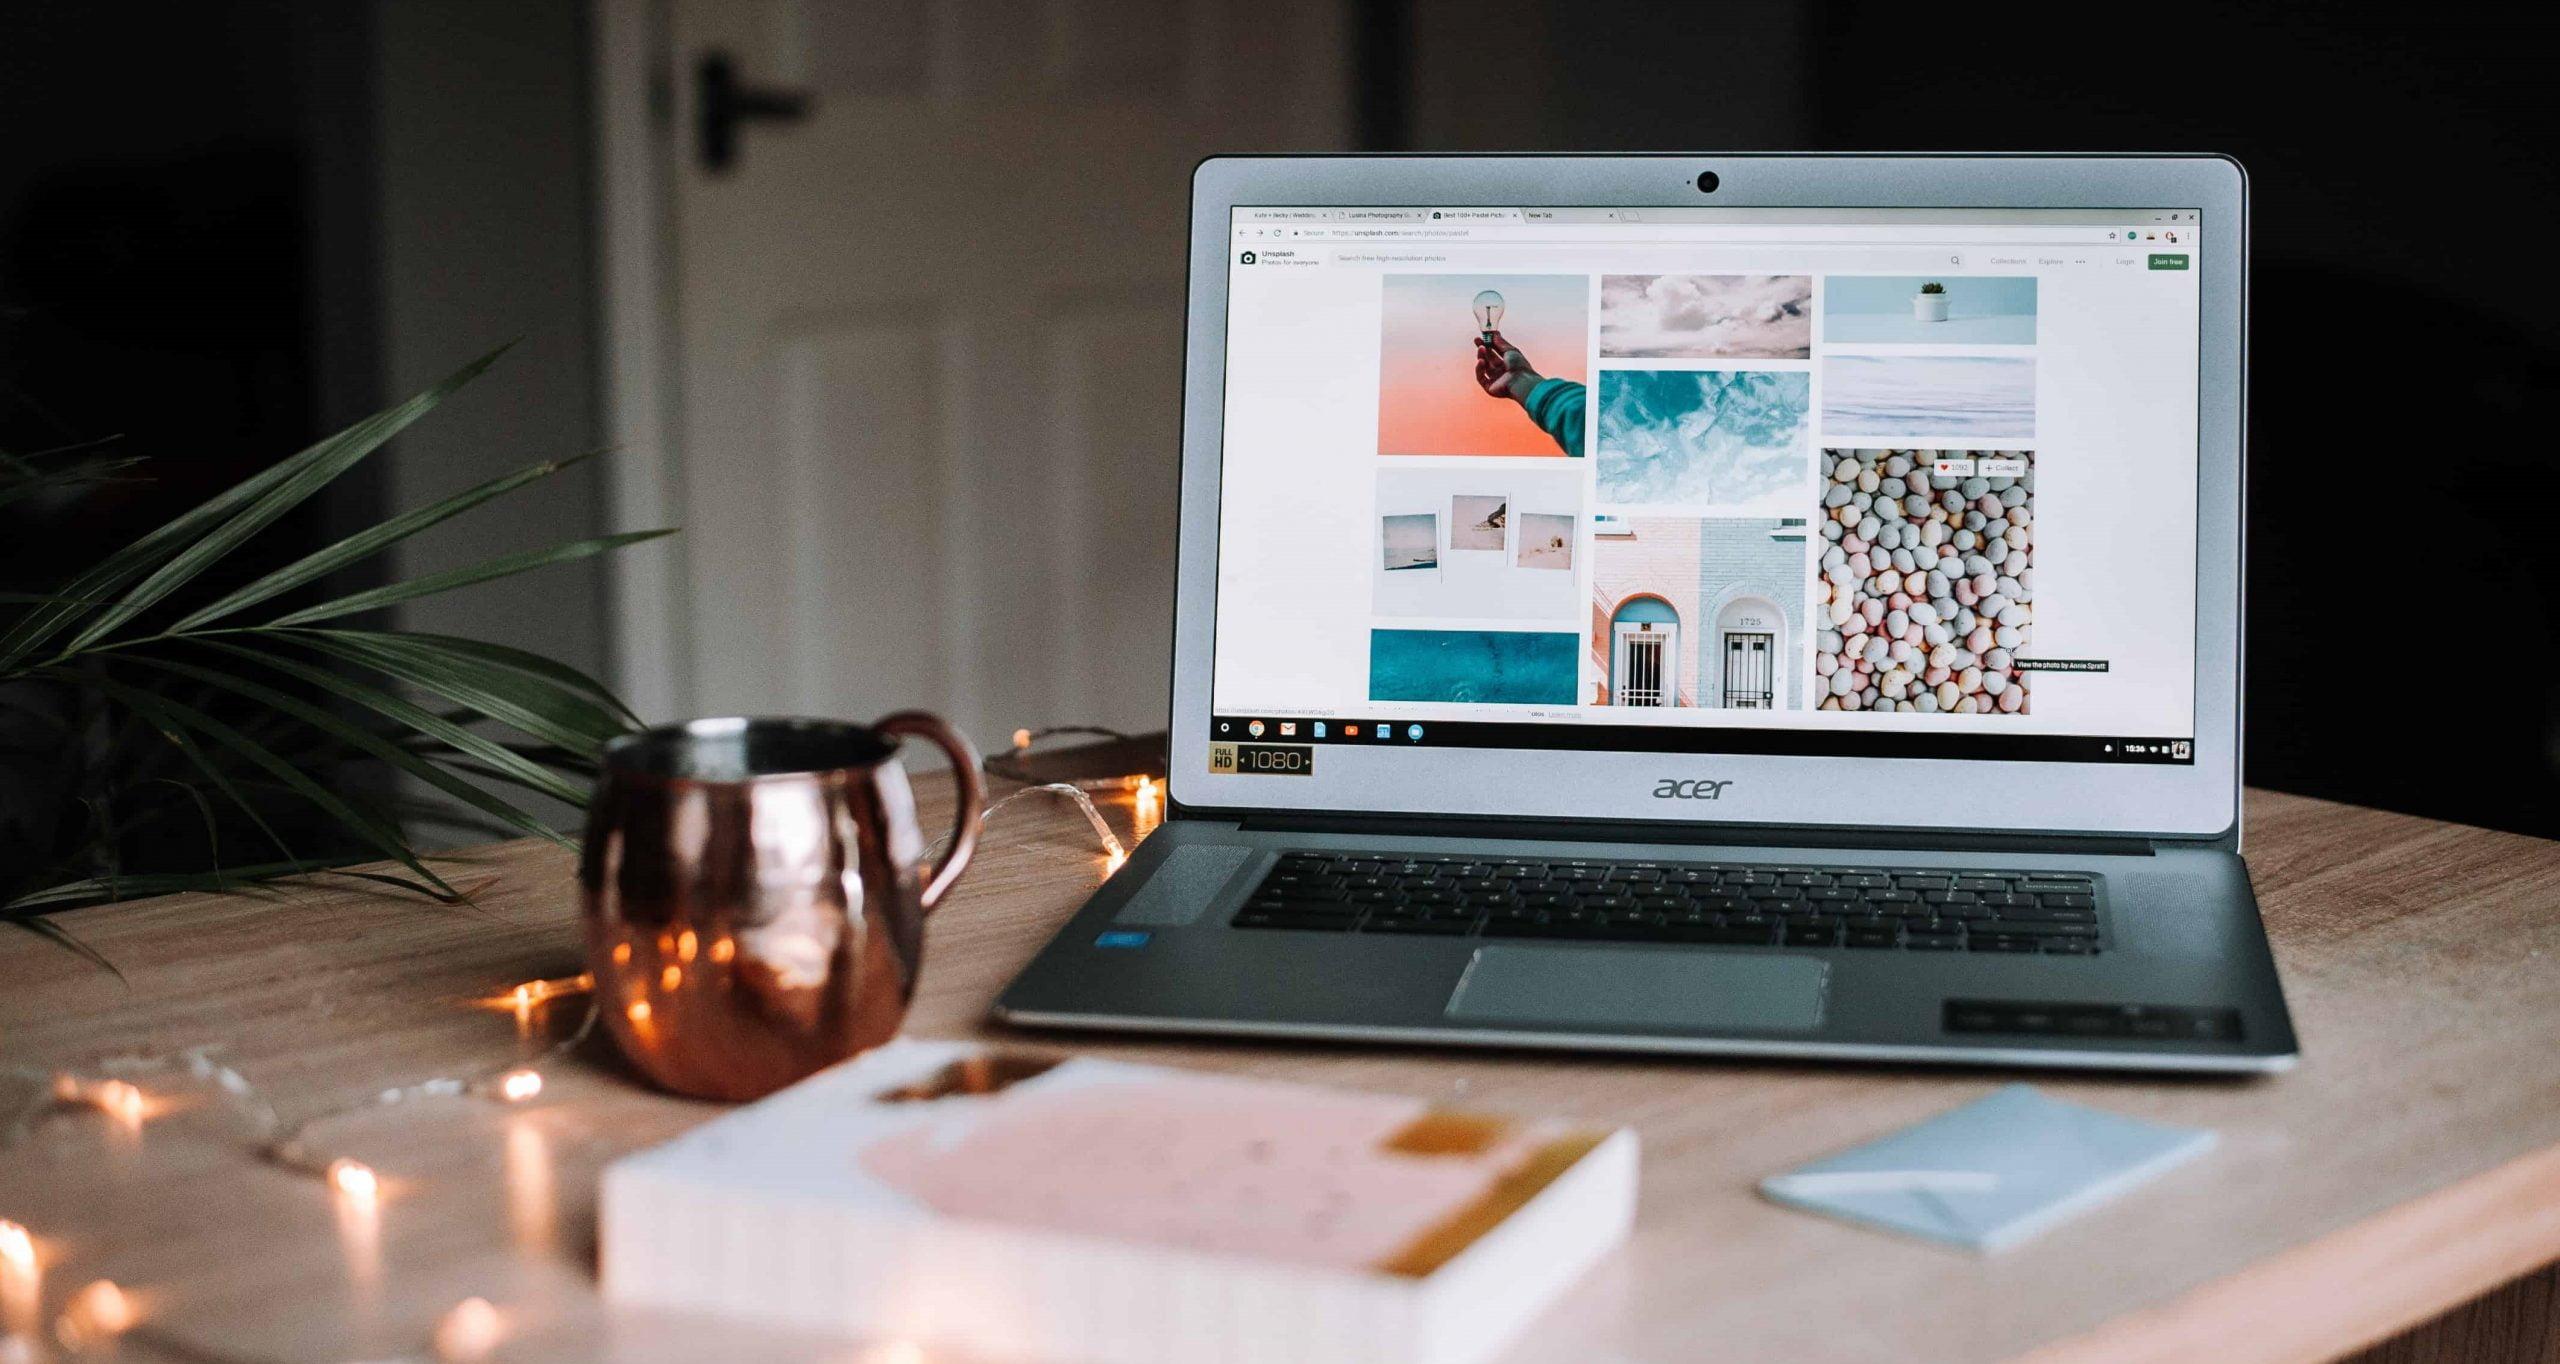 Pasos para crear un sitio web de comercio electrónico con WordPress